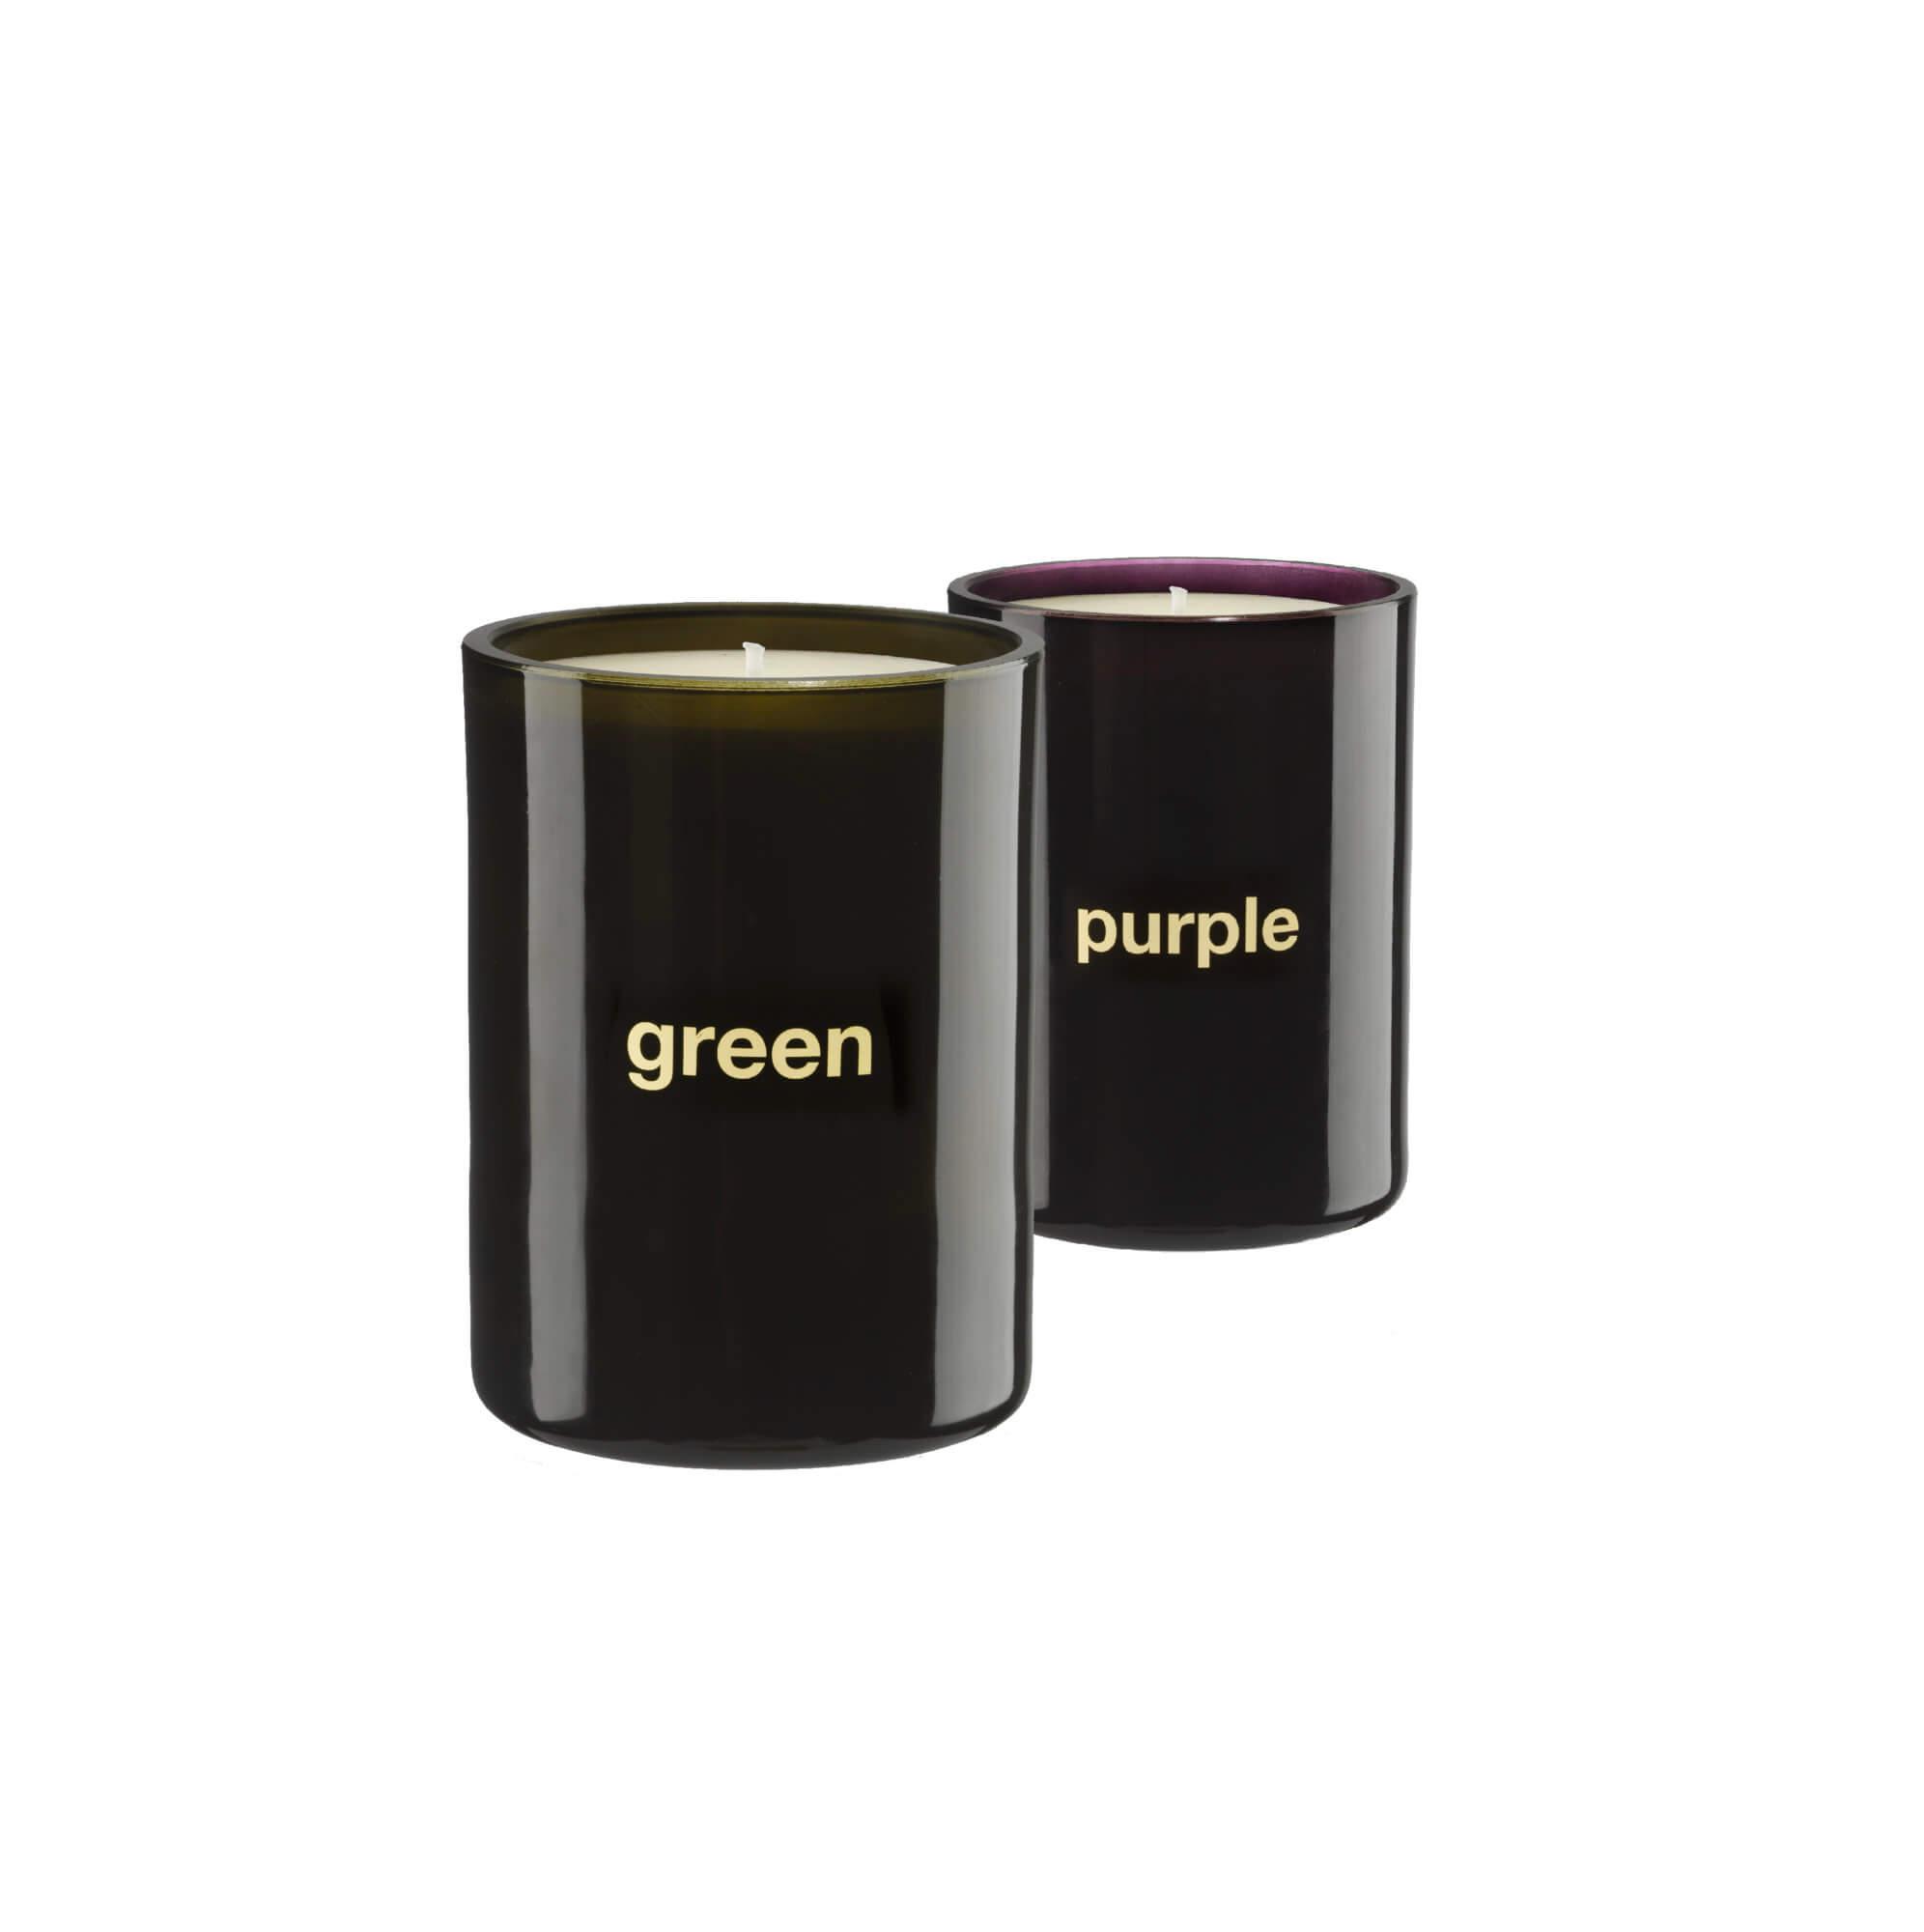 Green & Purple candles - India Mahdavi